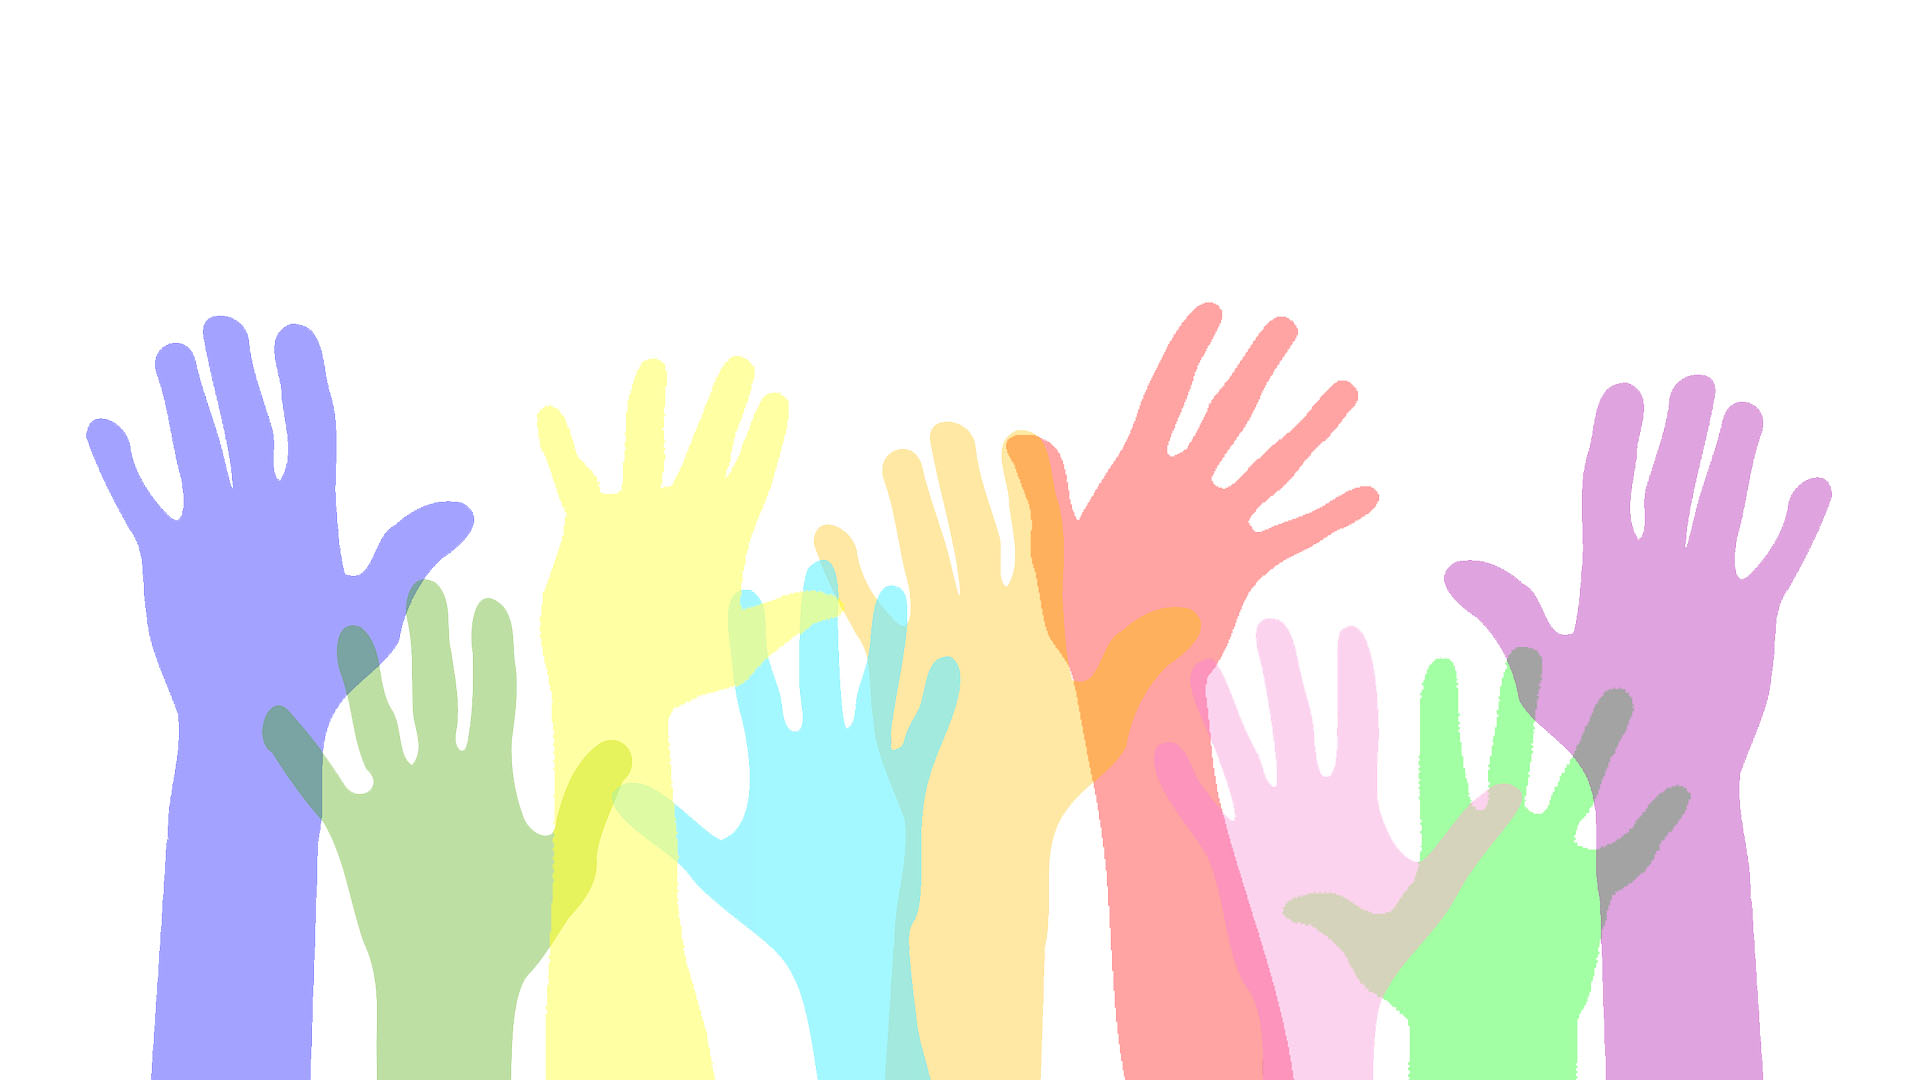 Hands-Up-To-Support-Donate-Volunteer-Lighter